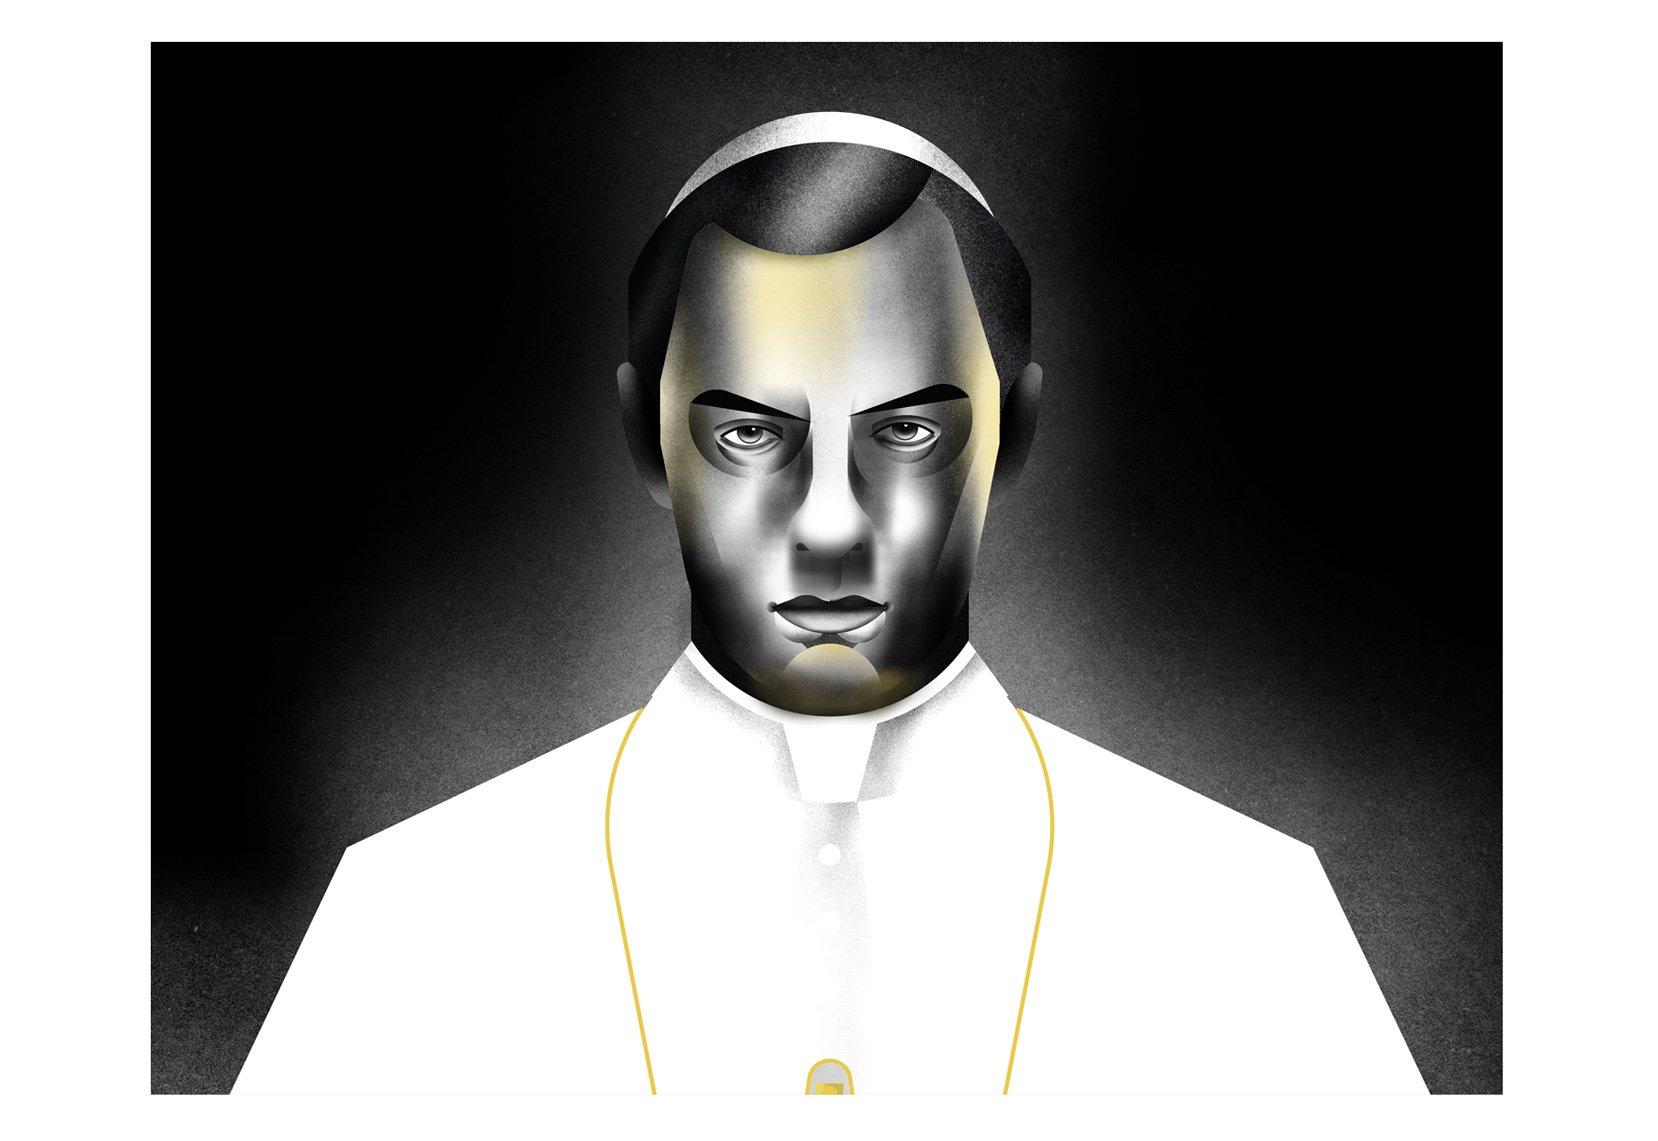 Sorrentino-illustration-youngpope-alice-iuri